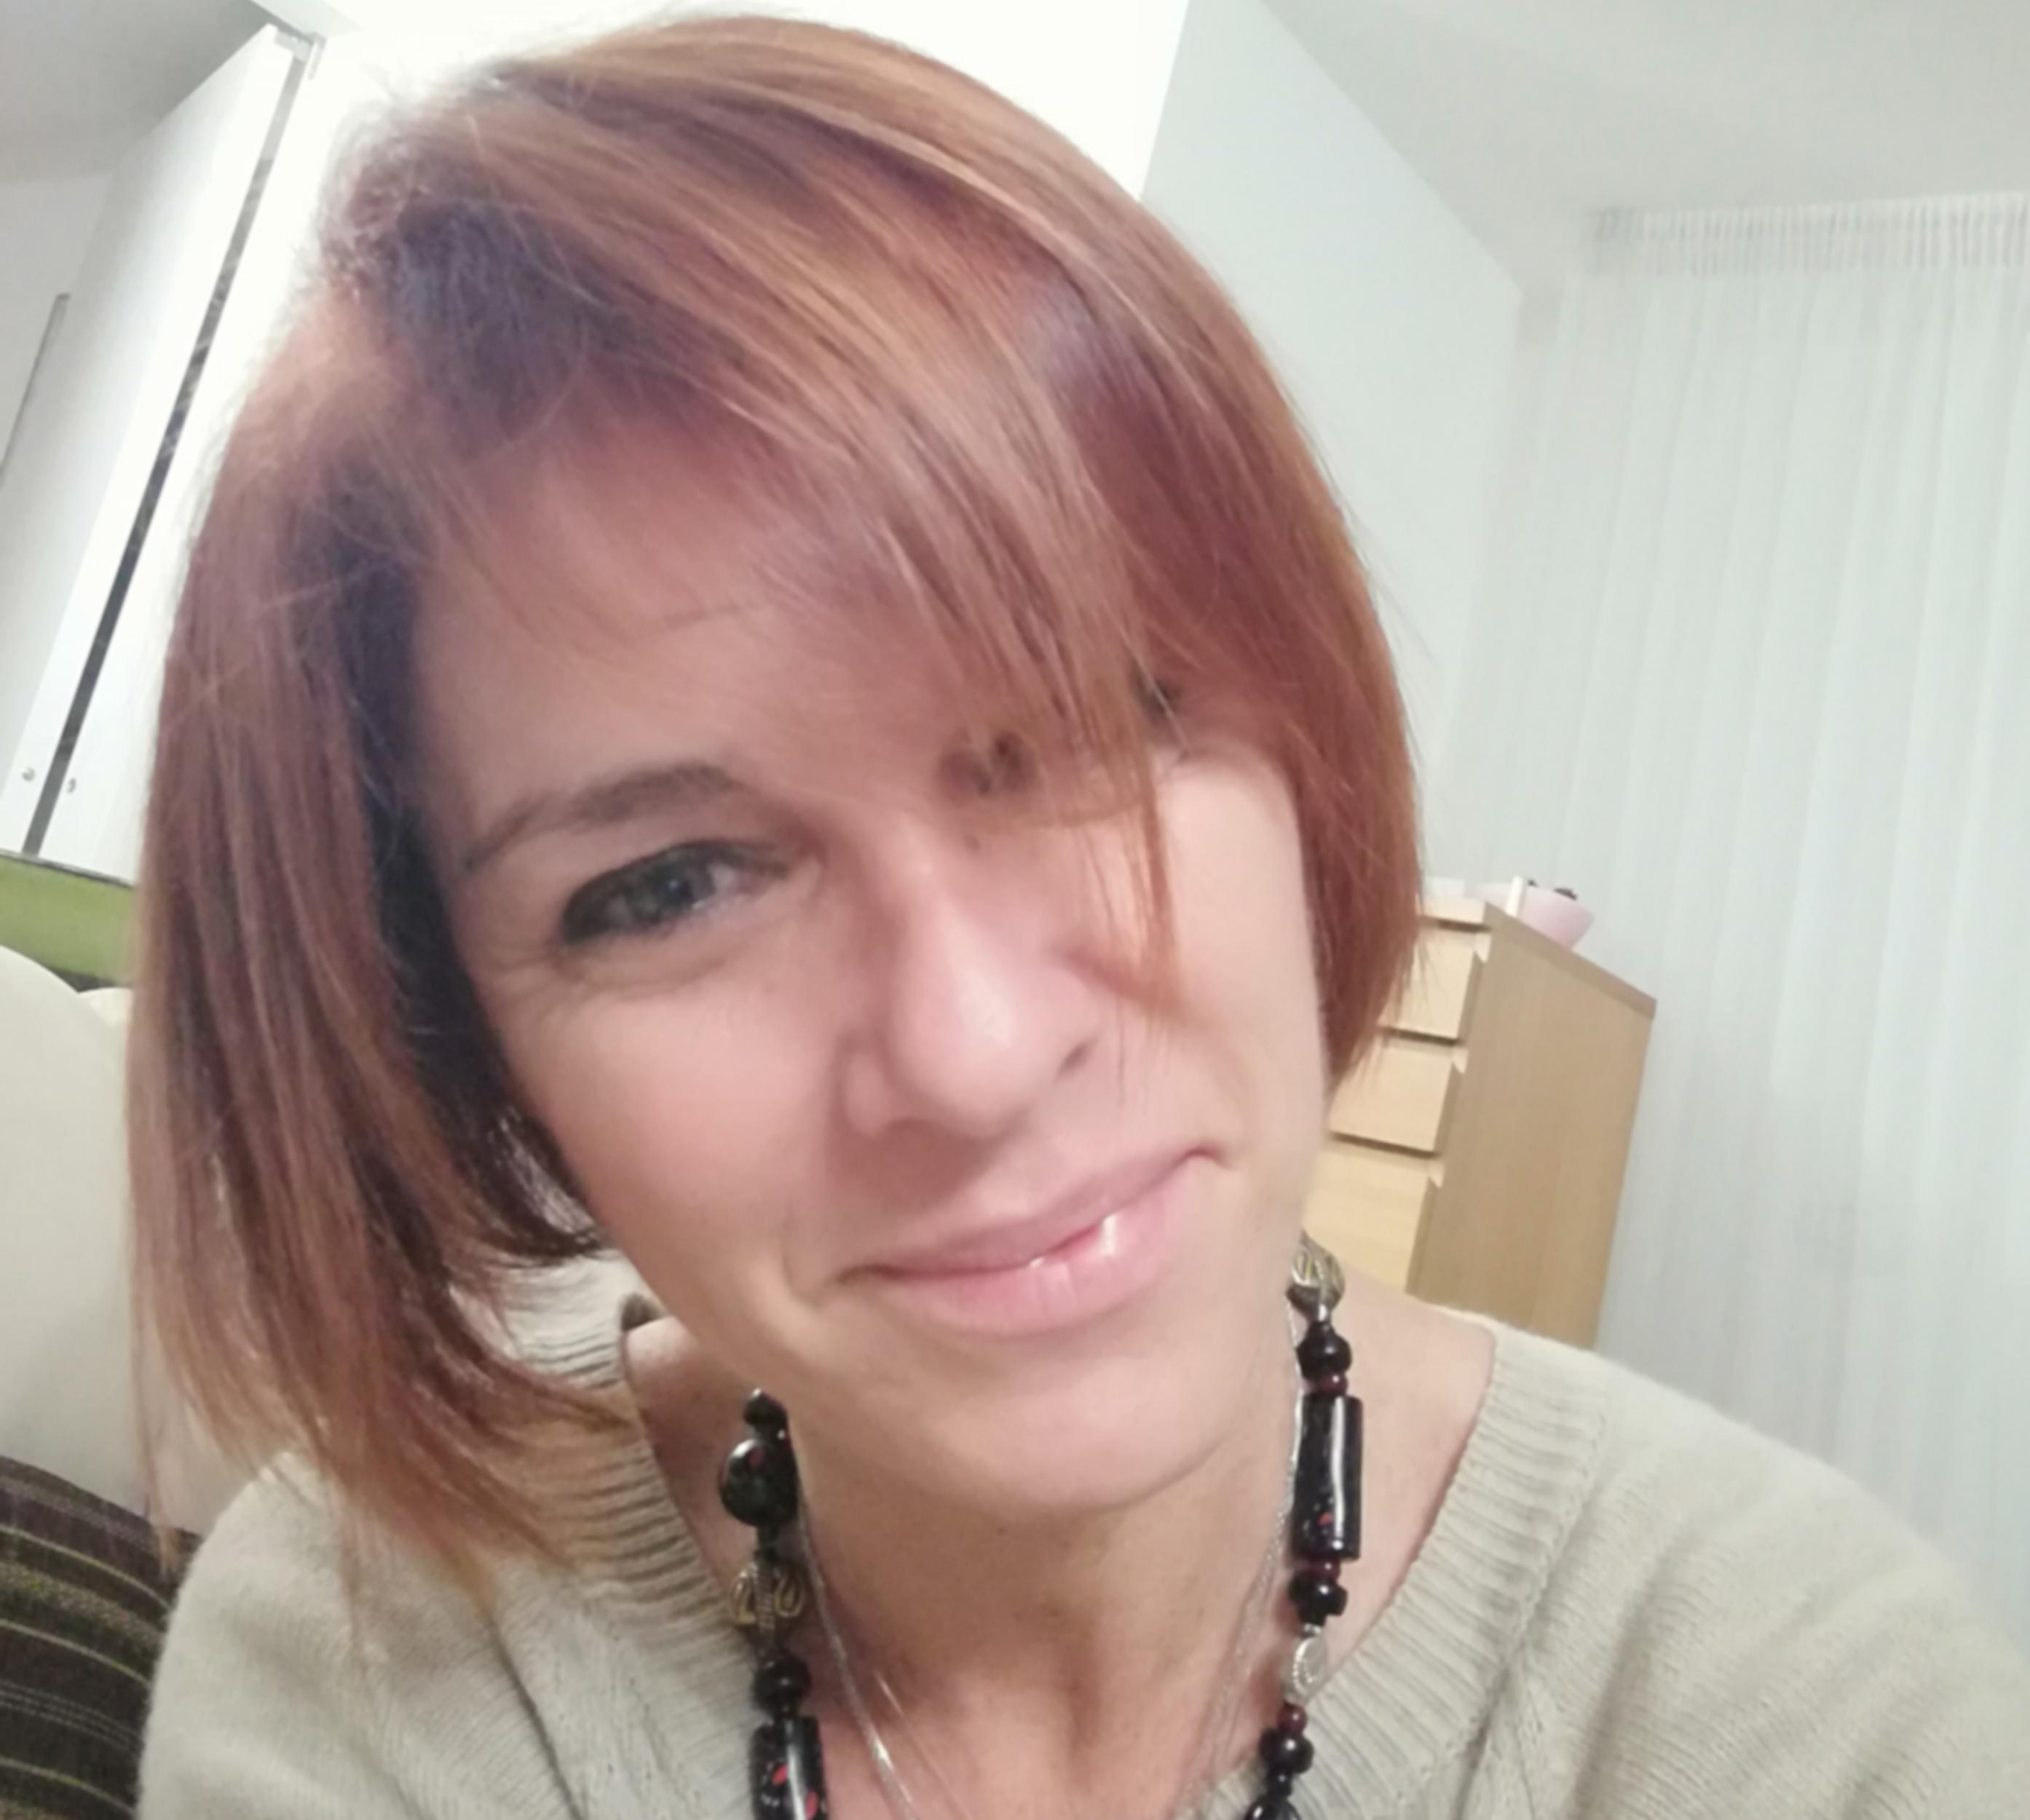 Dott. ssa Jessica Melluso